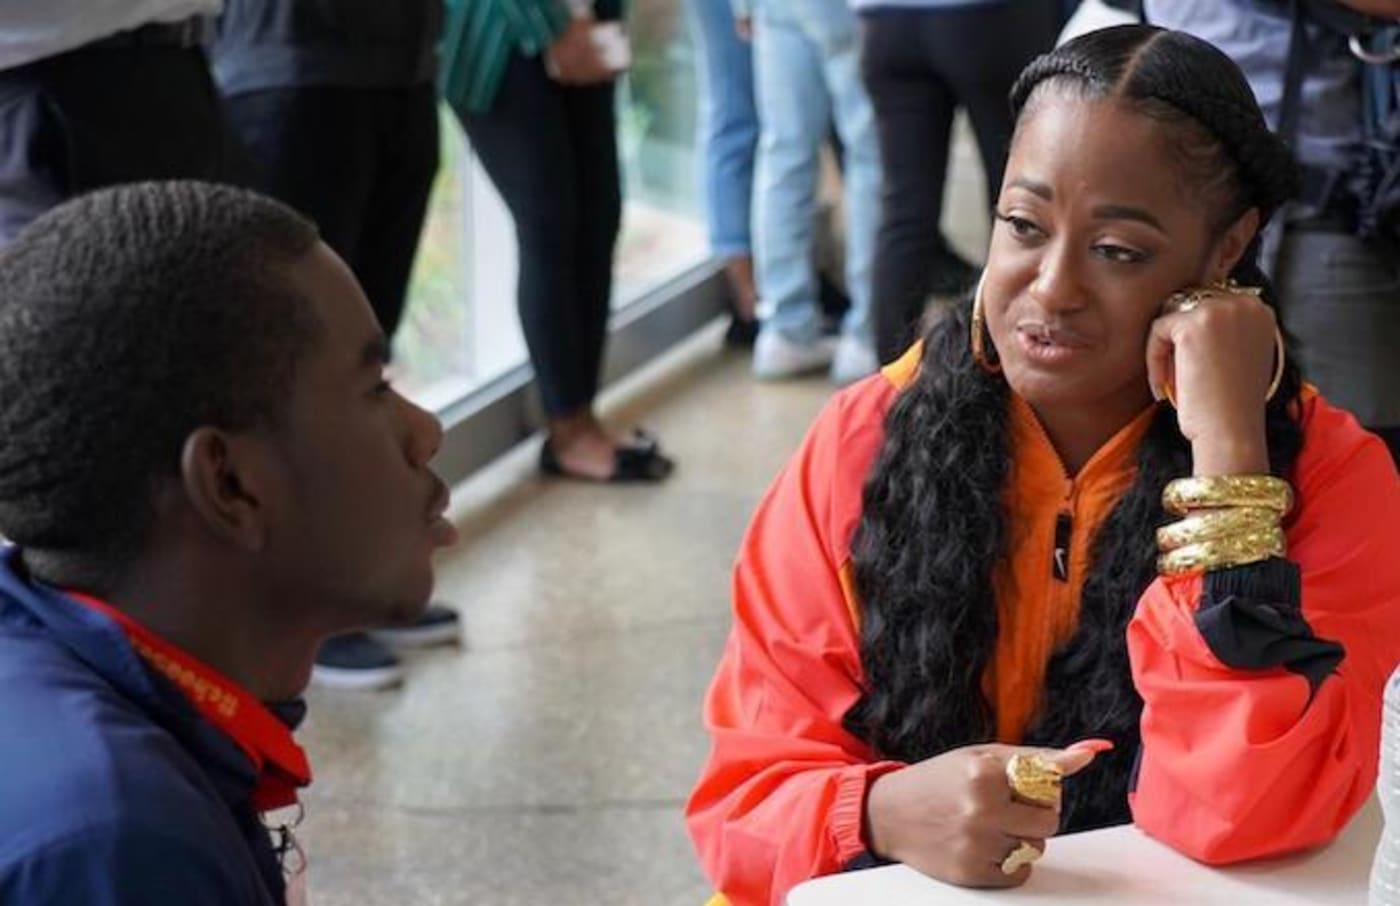 rapsody spearhead mentoring program chicago teenagers